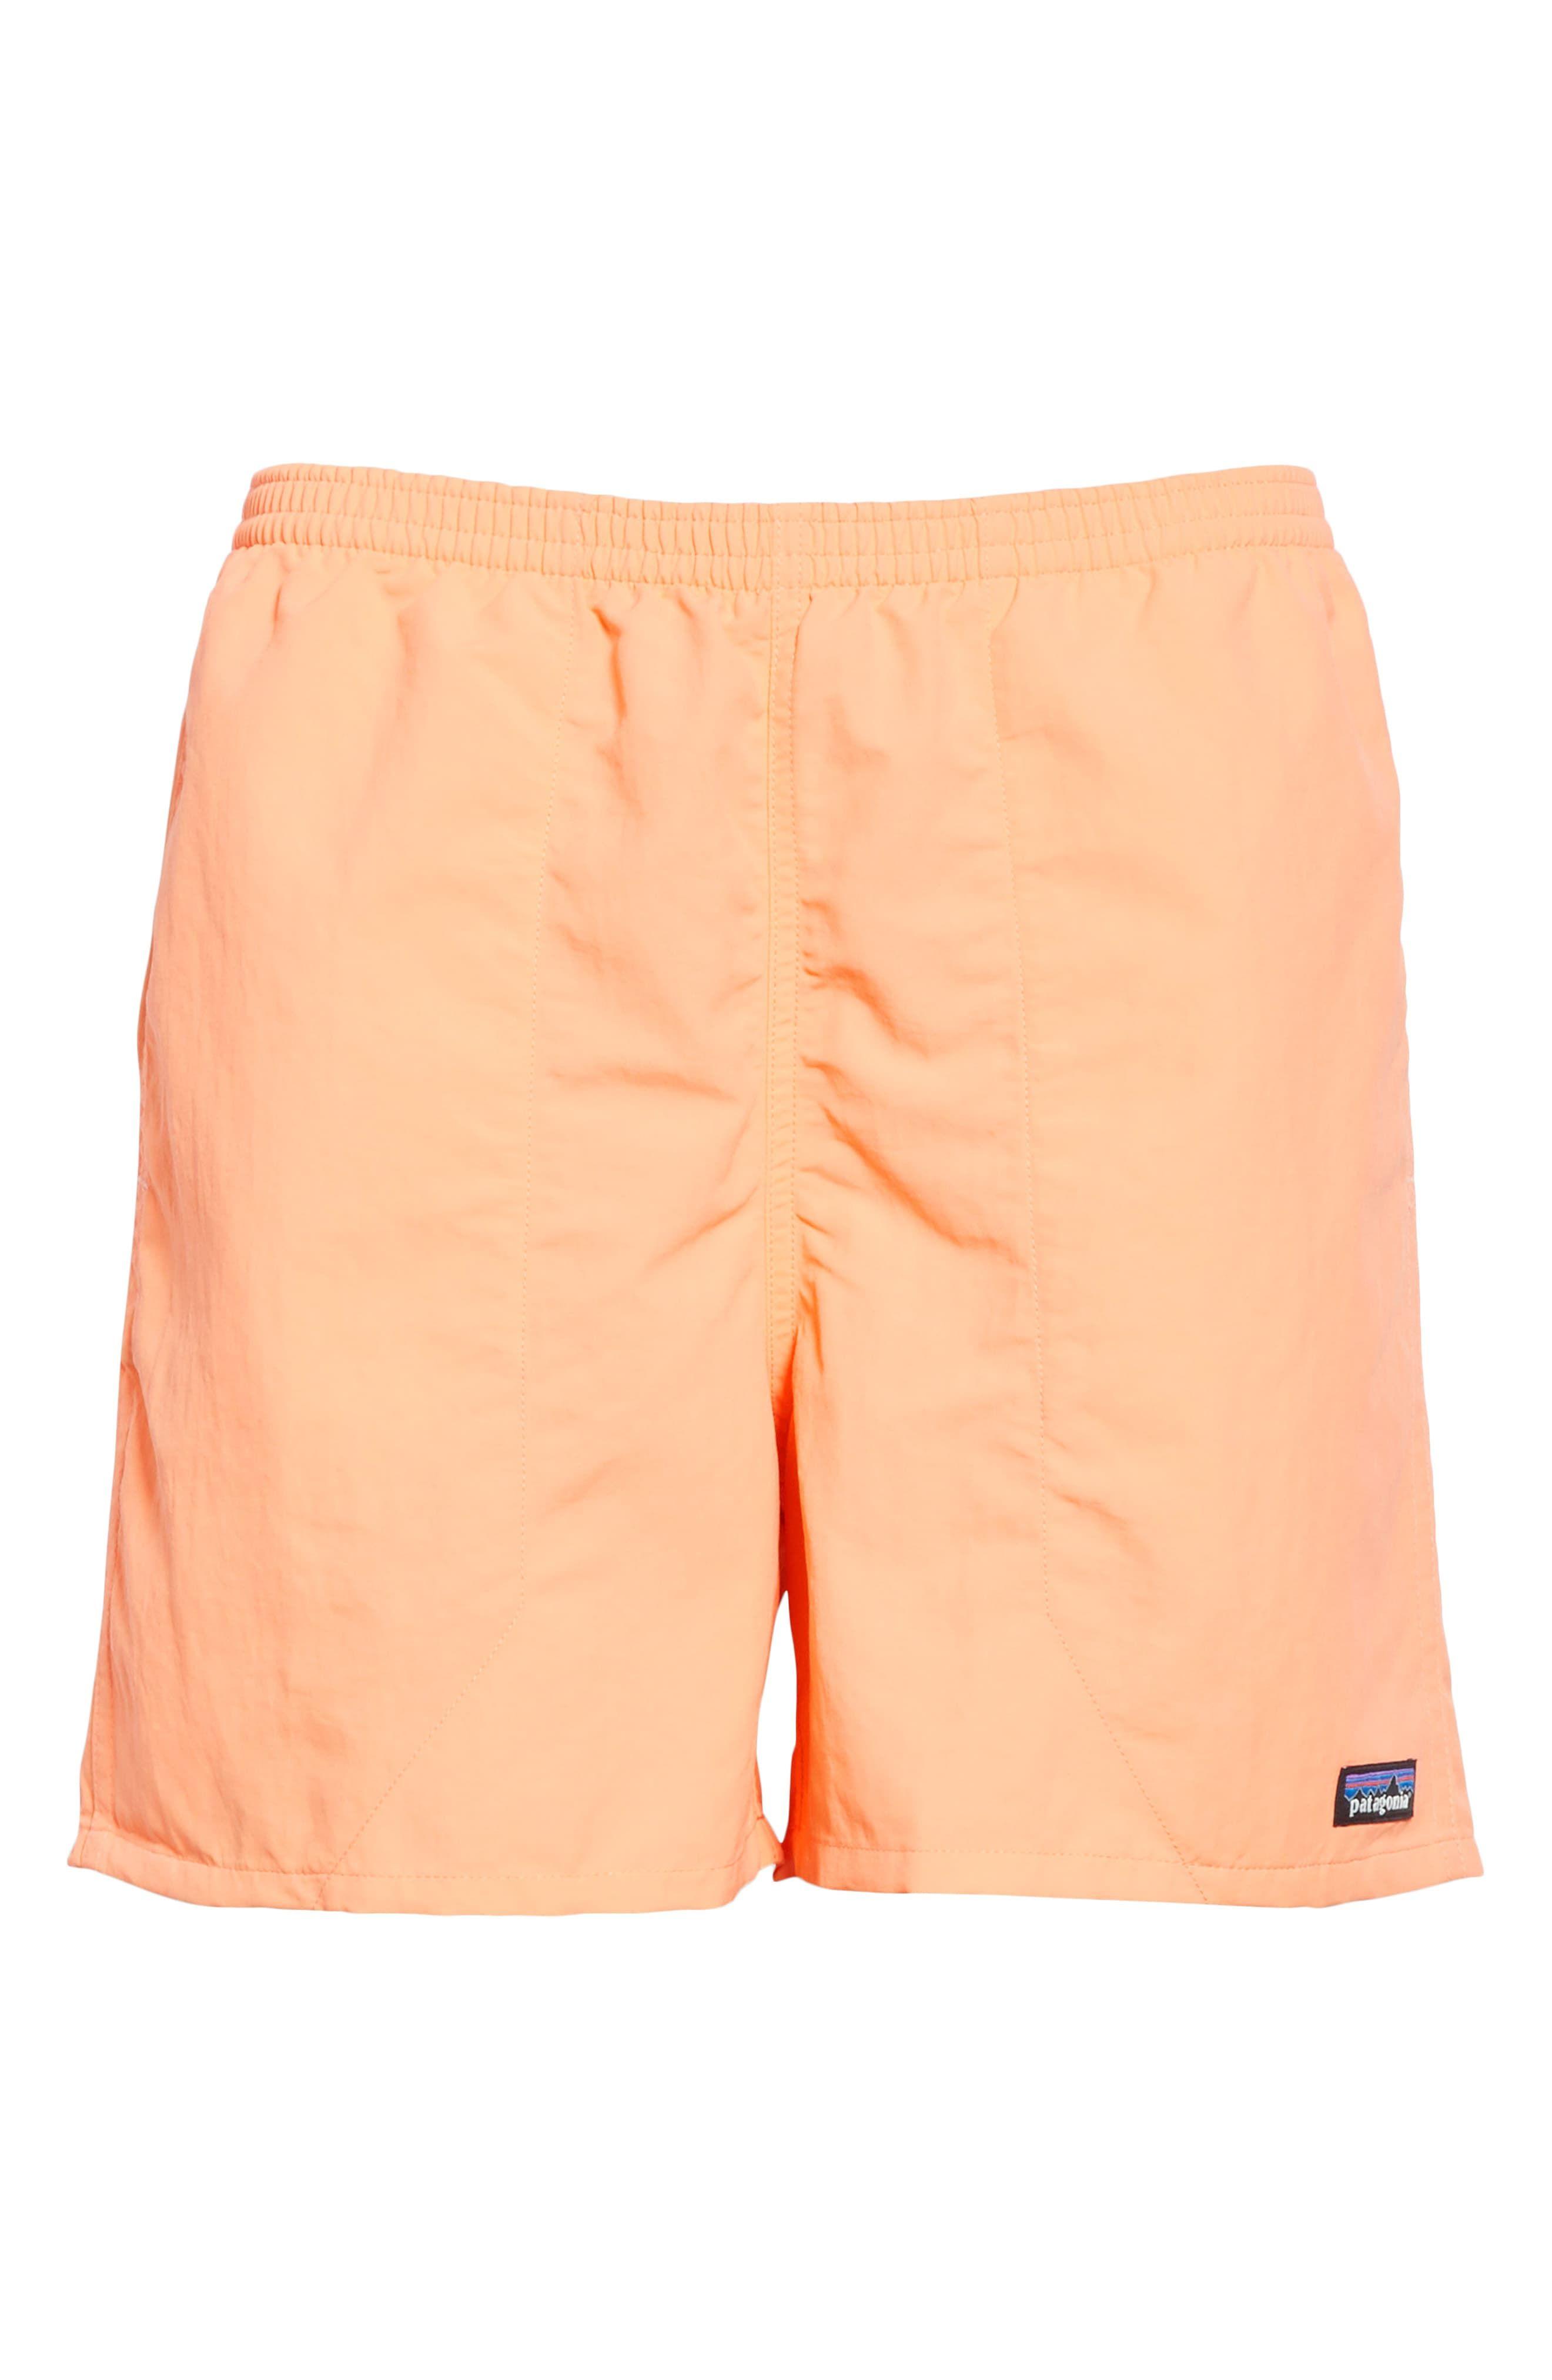 59b413f119 Men's Patagonia Baggies 5-Inch Swim Trunks, Size Small - Orange in ...